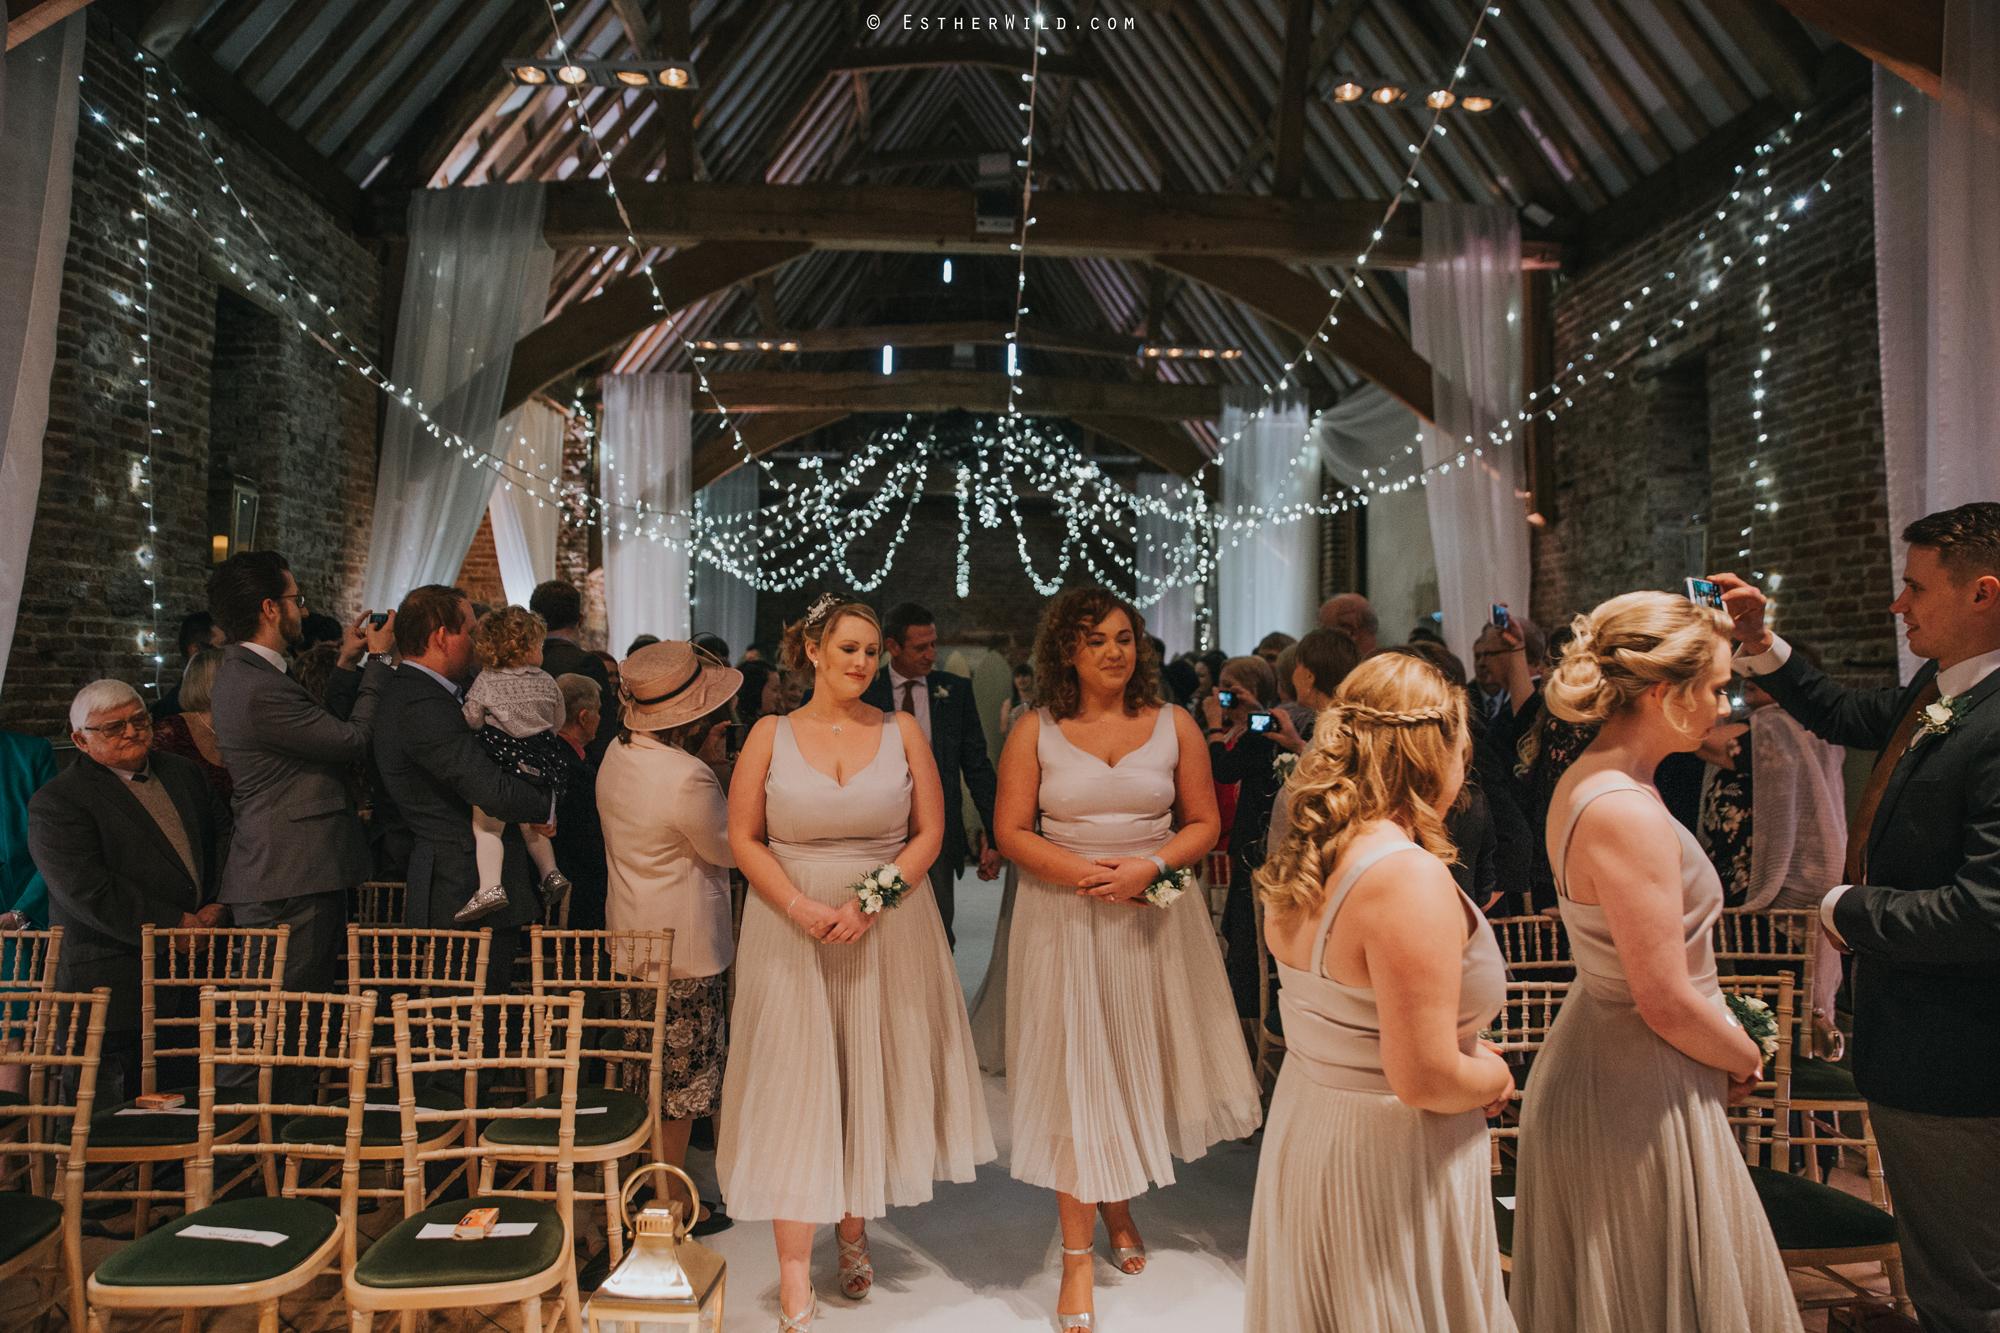 Elms_Barn_Weddings_Suffolk_Photographer_Copyright_Esther_Wild_IMG_1063.jpg